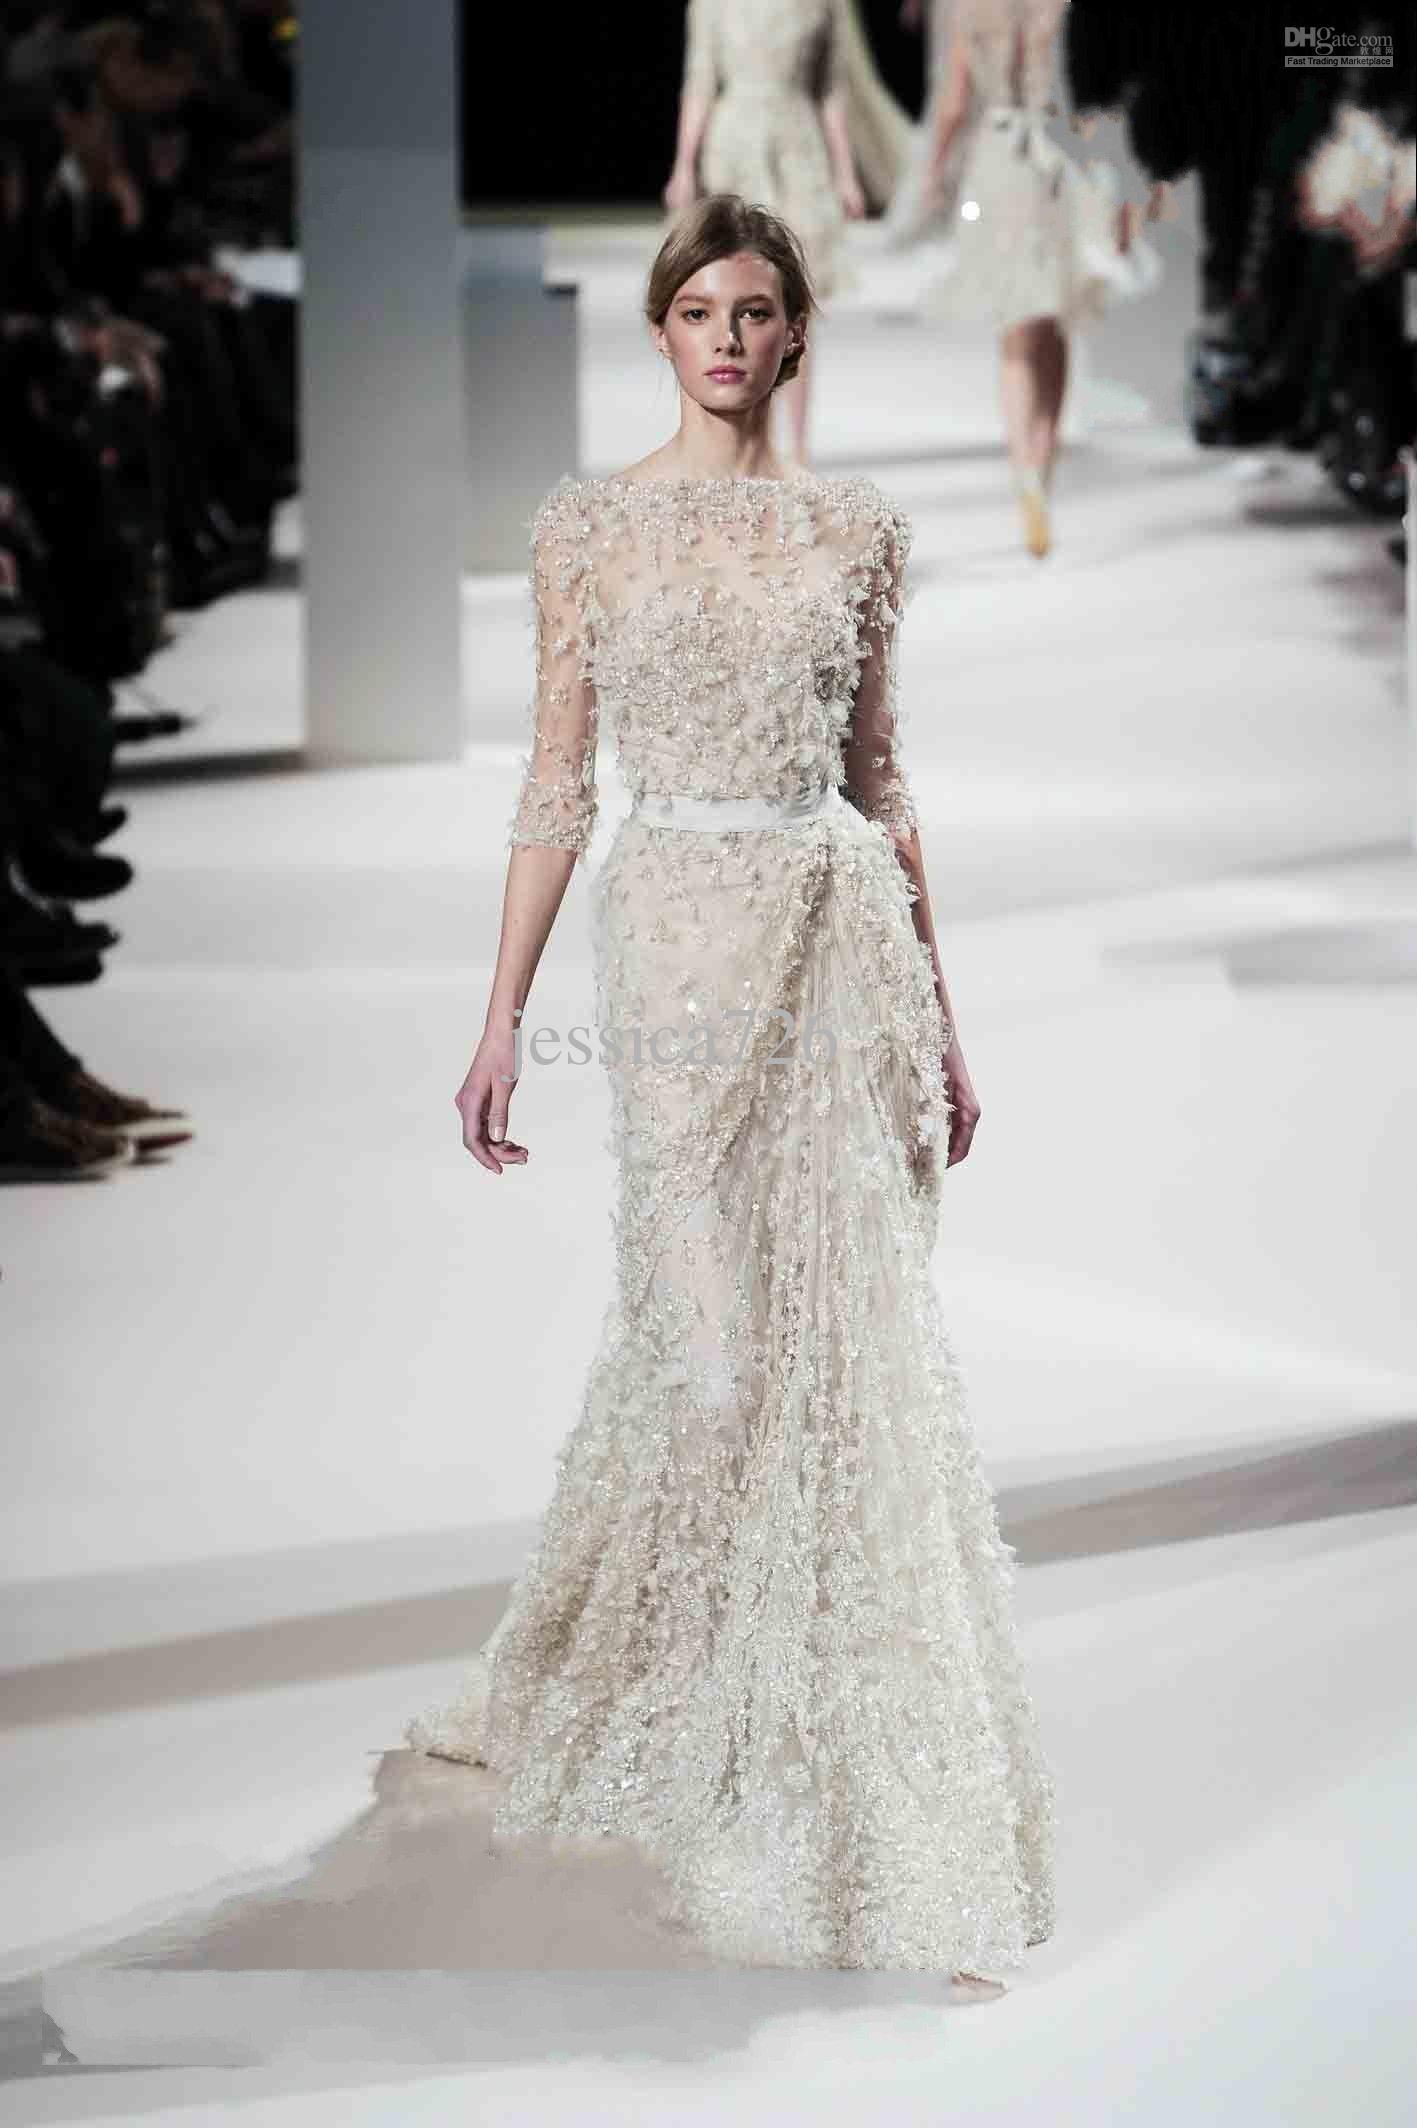 Luxury Evening Dresses In Usa - Plus Size Masquerade Dresses